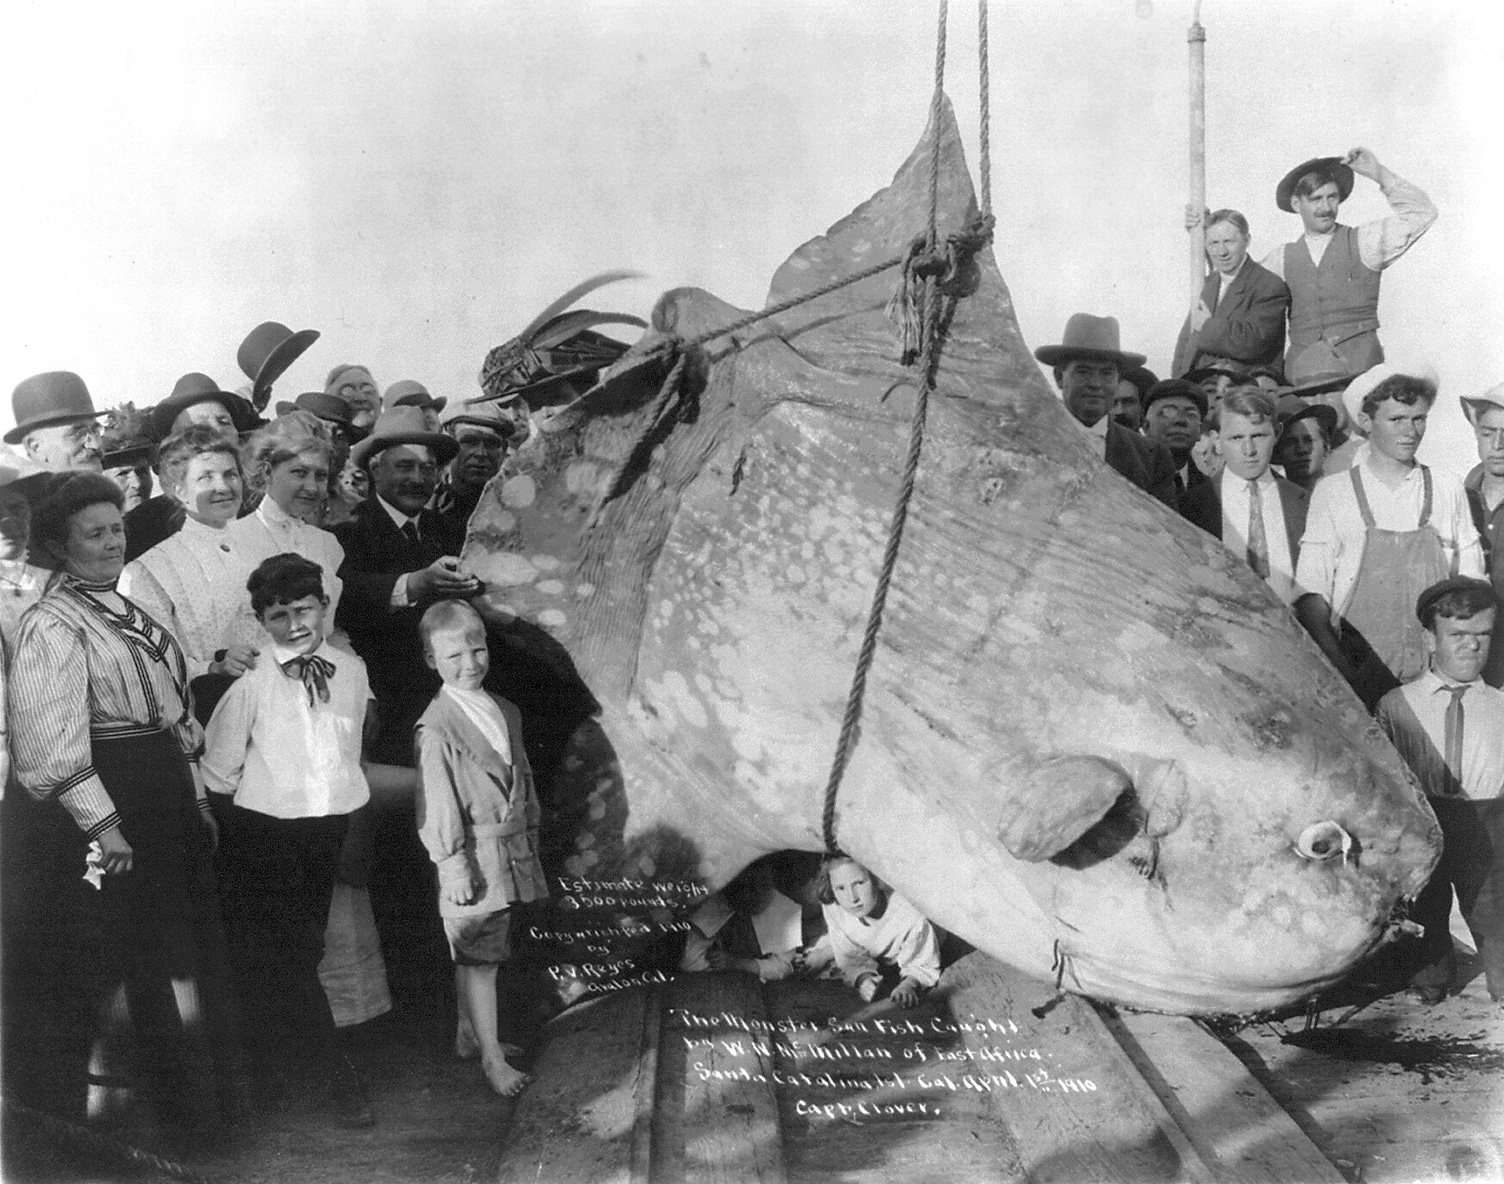 Enormous_Sunfish.jpg